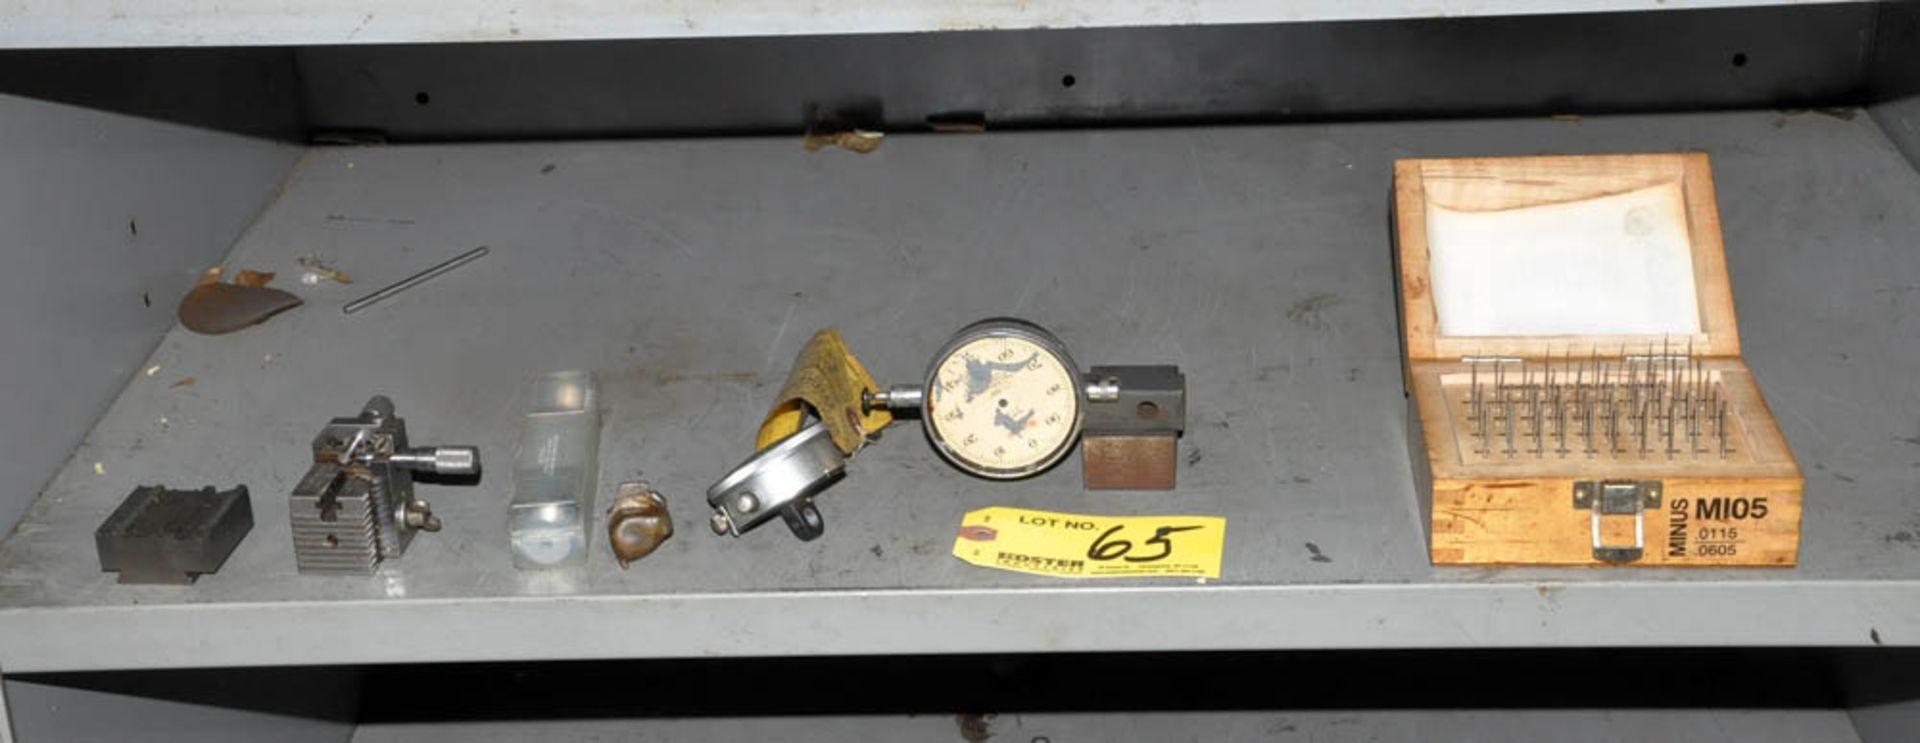 M25 PIN GAGE SET, (2) DIAL INDICATOR GAGES, V-BLOCK ETC. ON (1) SHELF